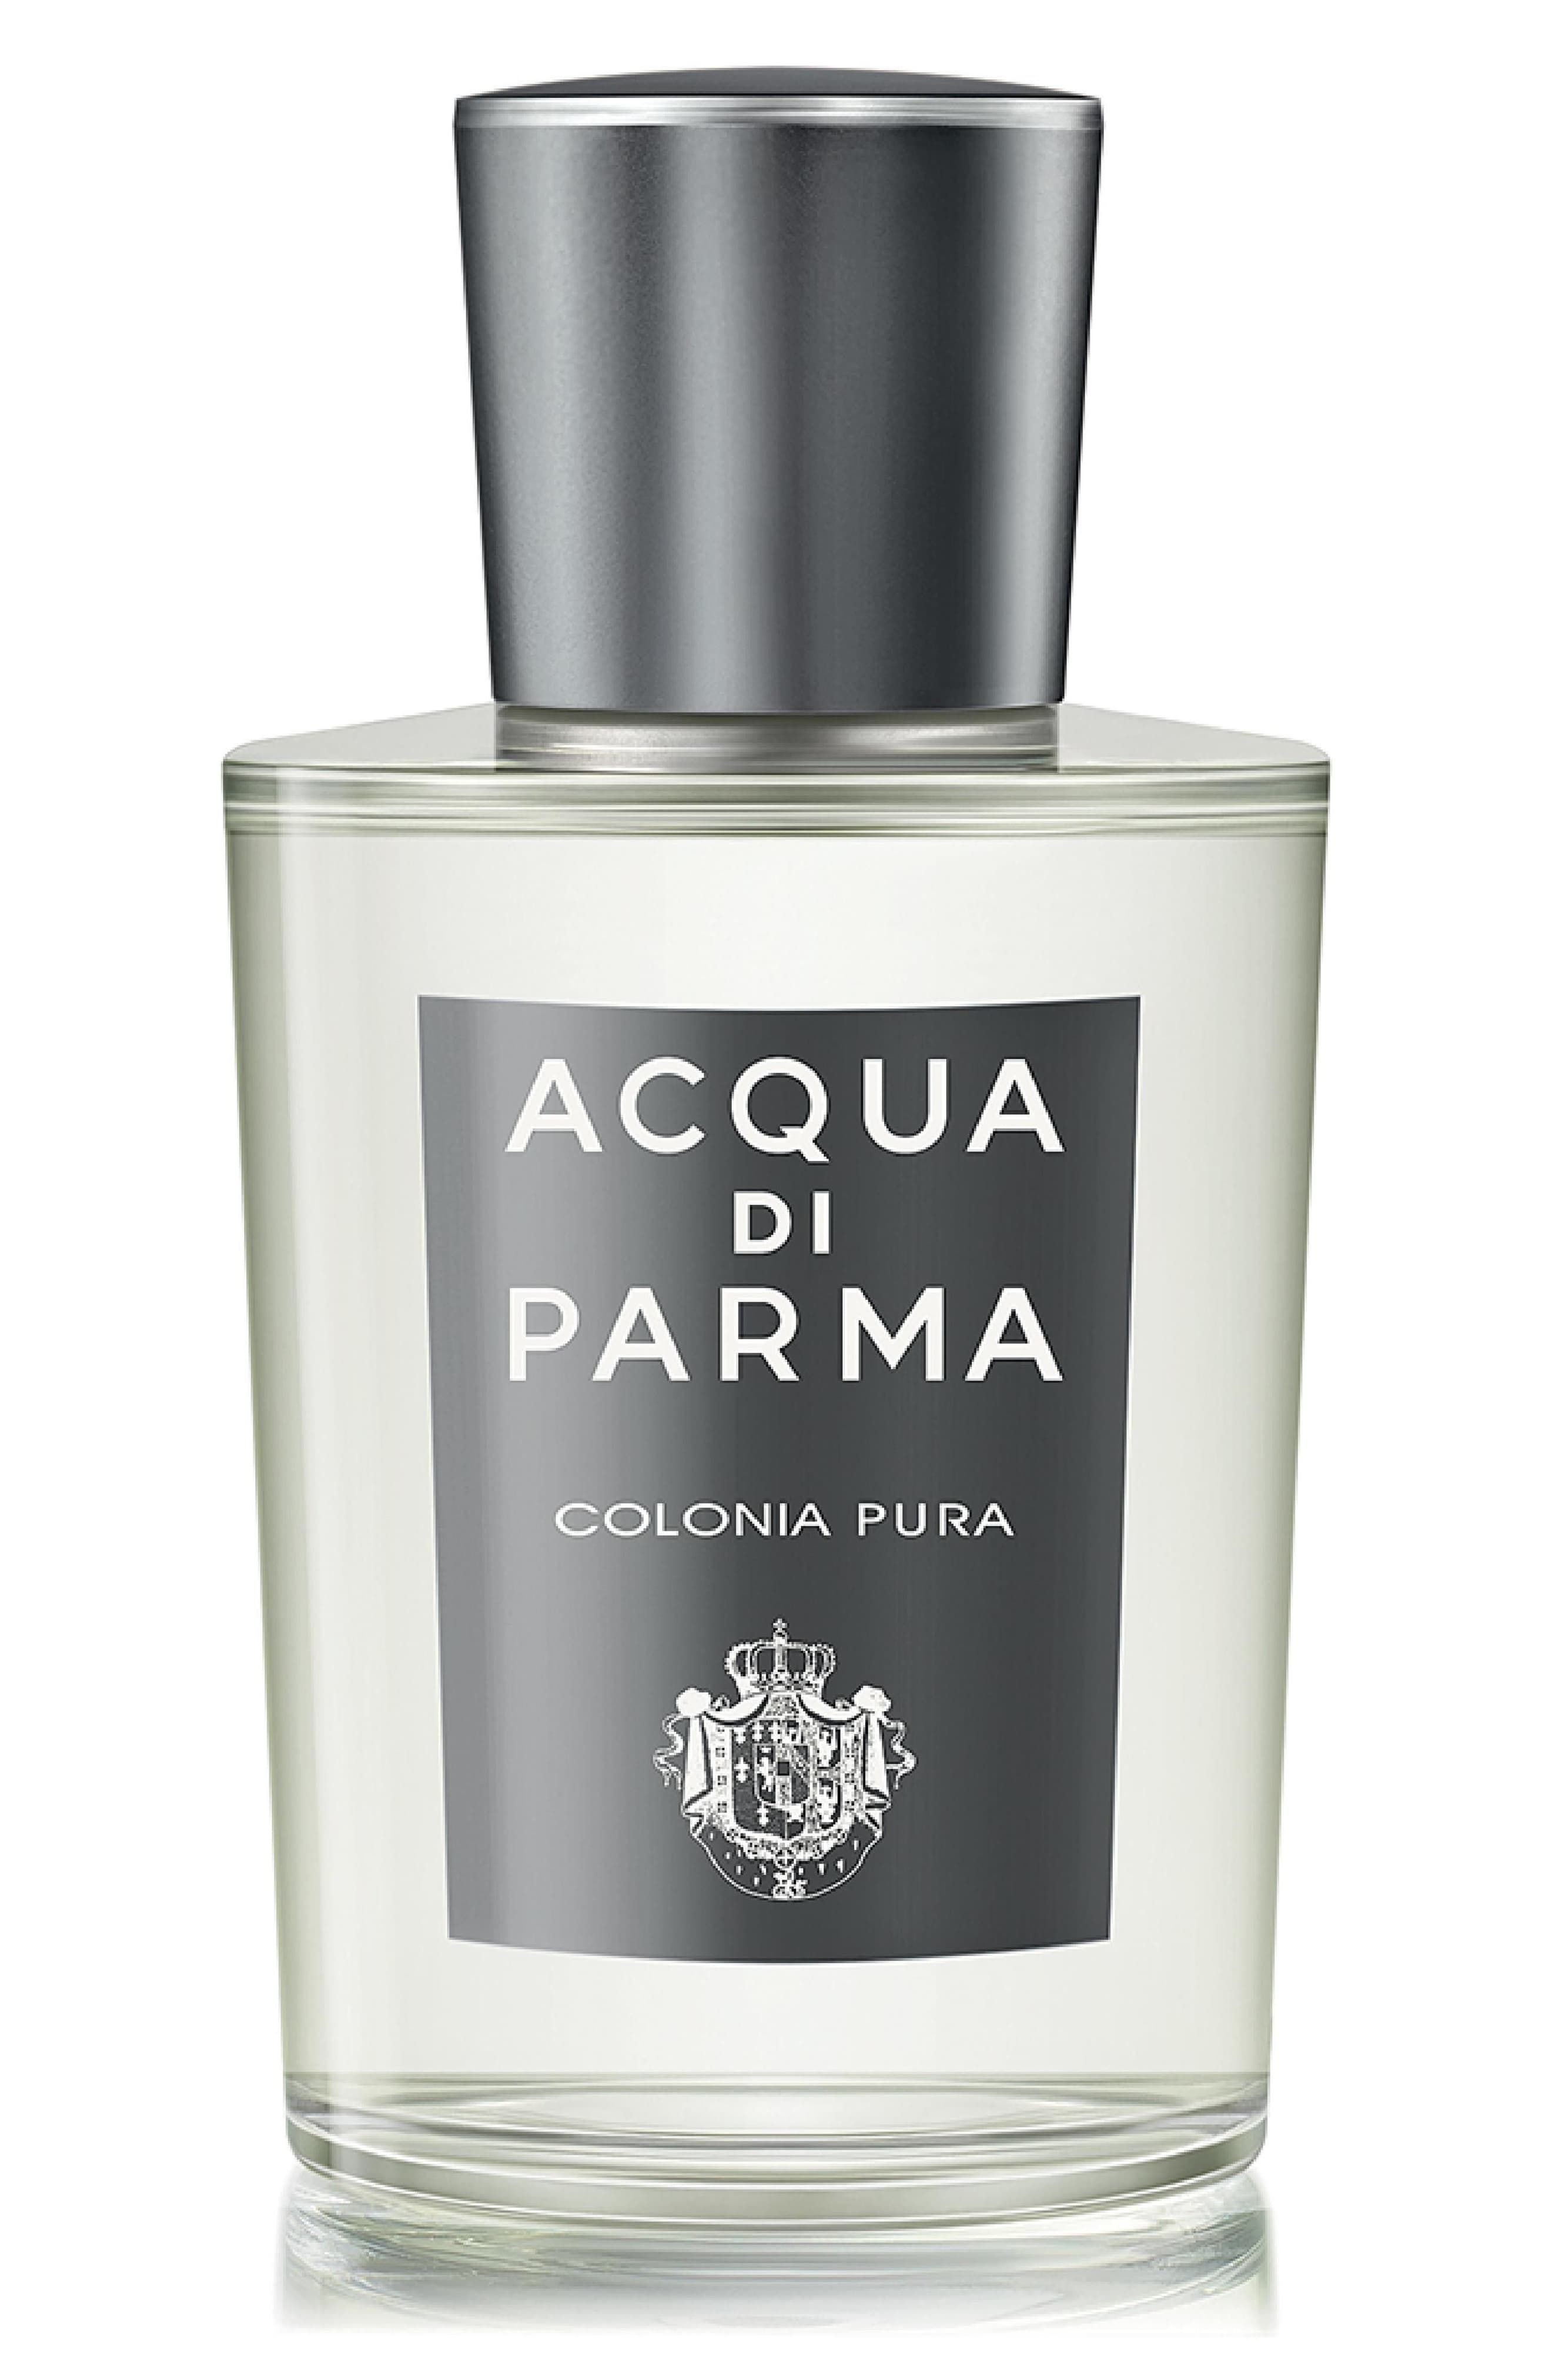 Acqua Di Parma Colonia Pura Eau De Cologne Nordstrom Perfume Eau De Cologne Cologne Spray